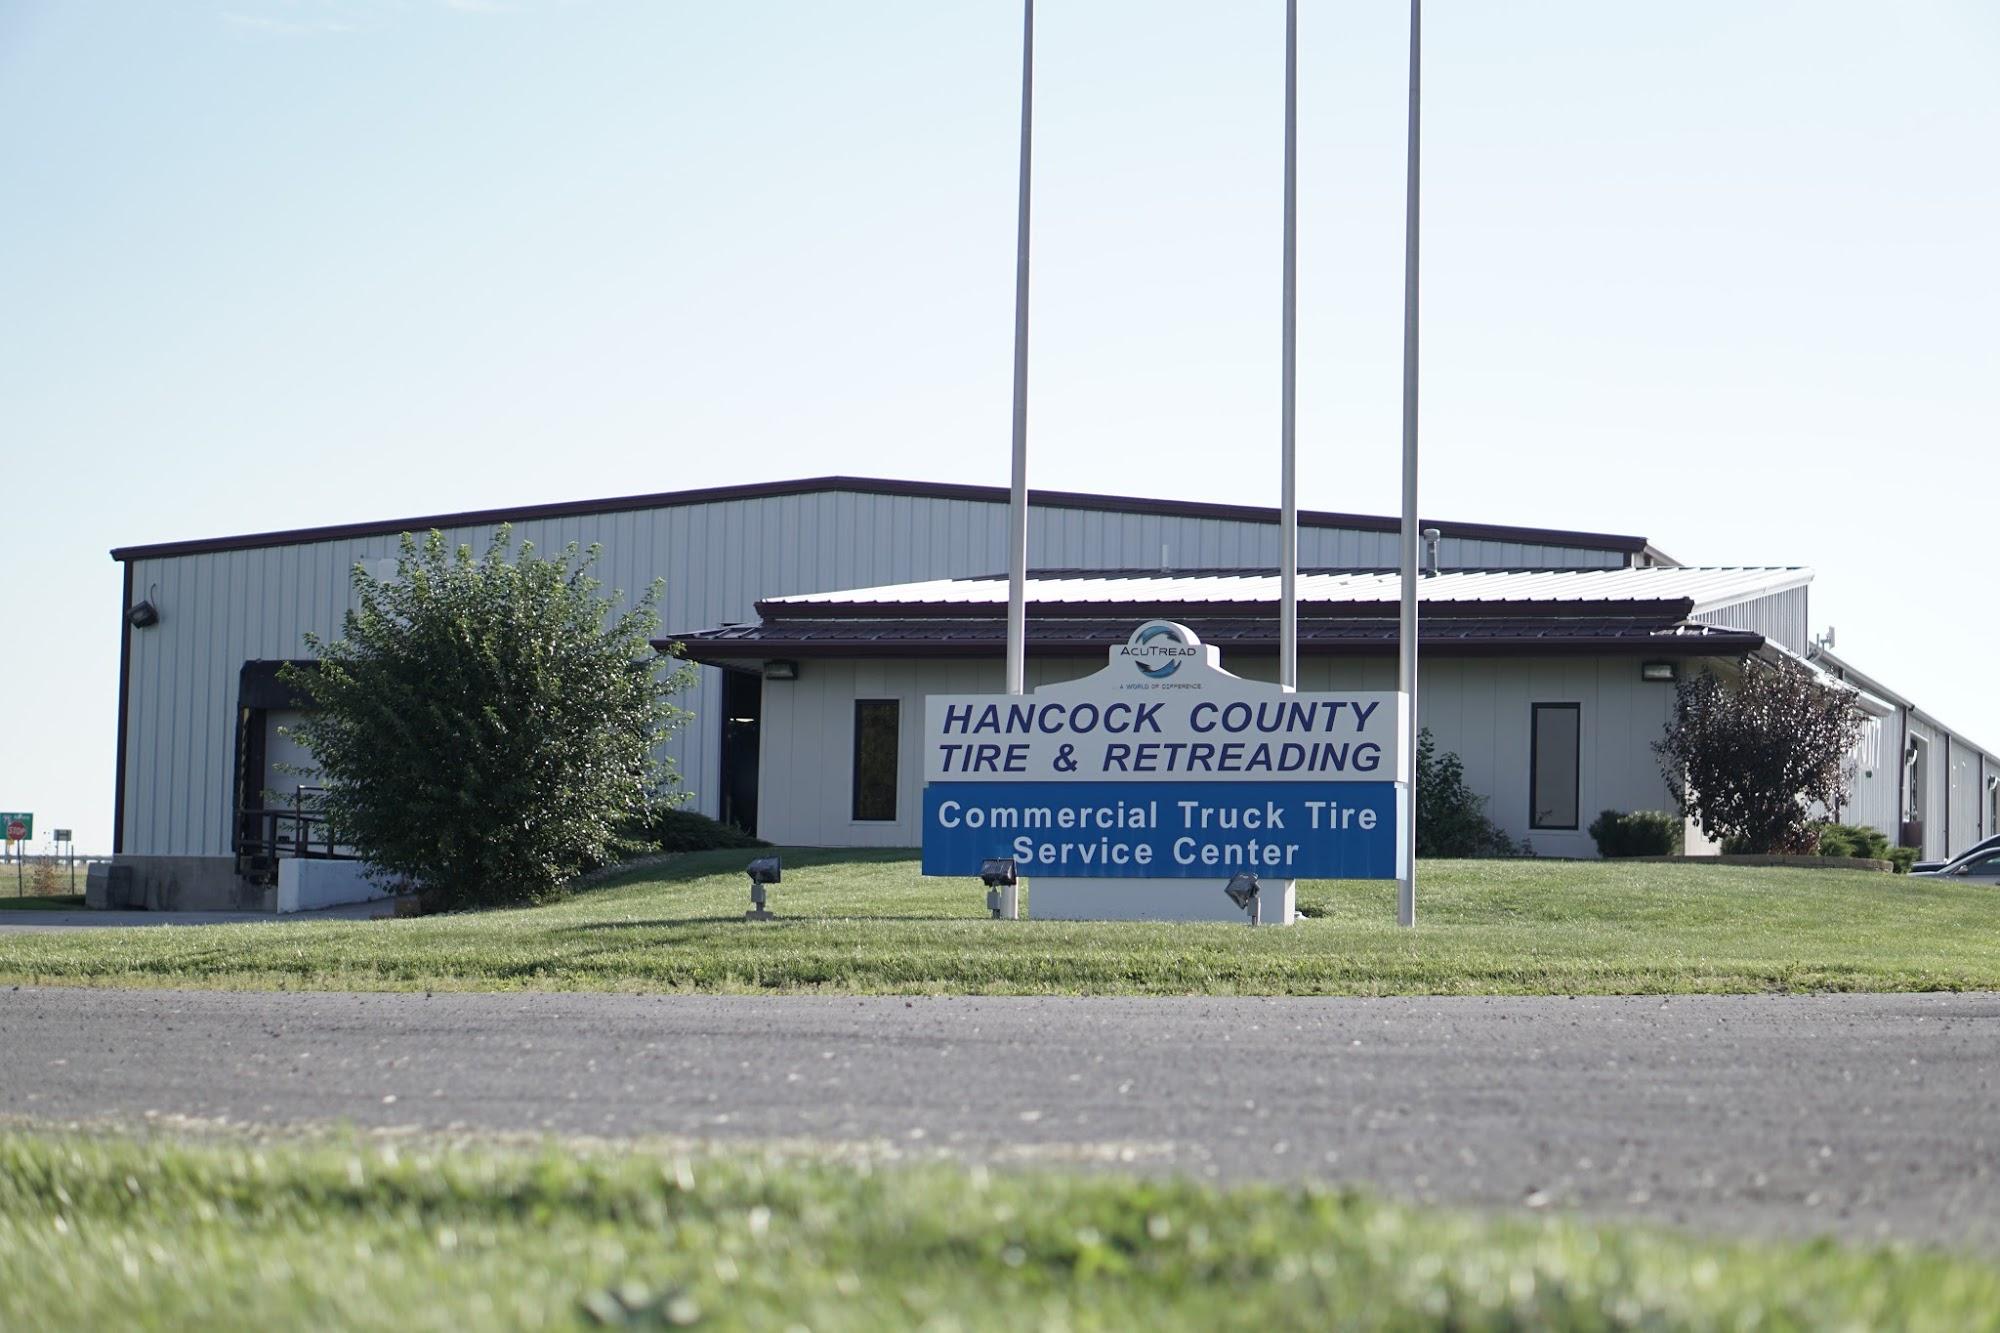 Hancock County Tire